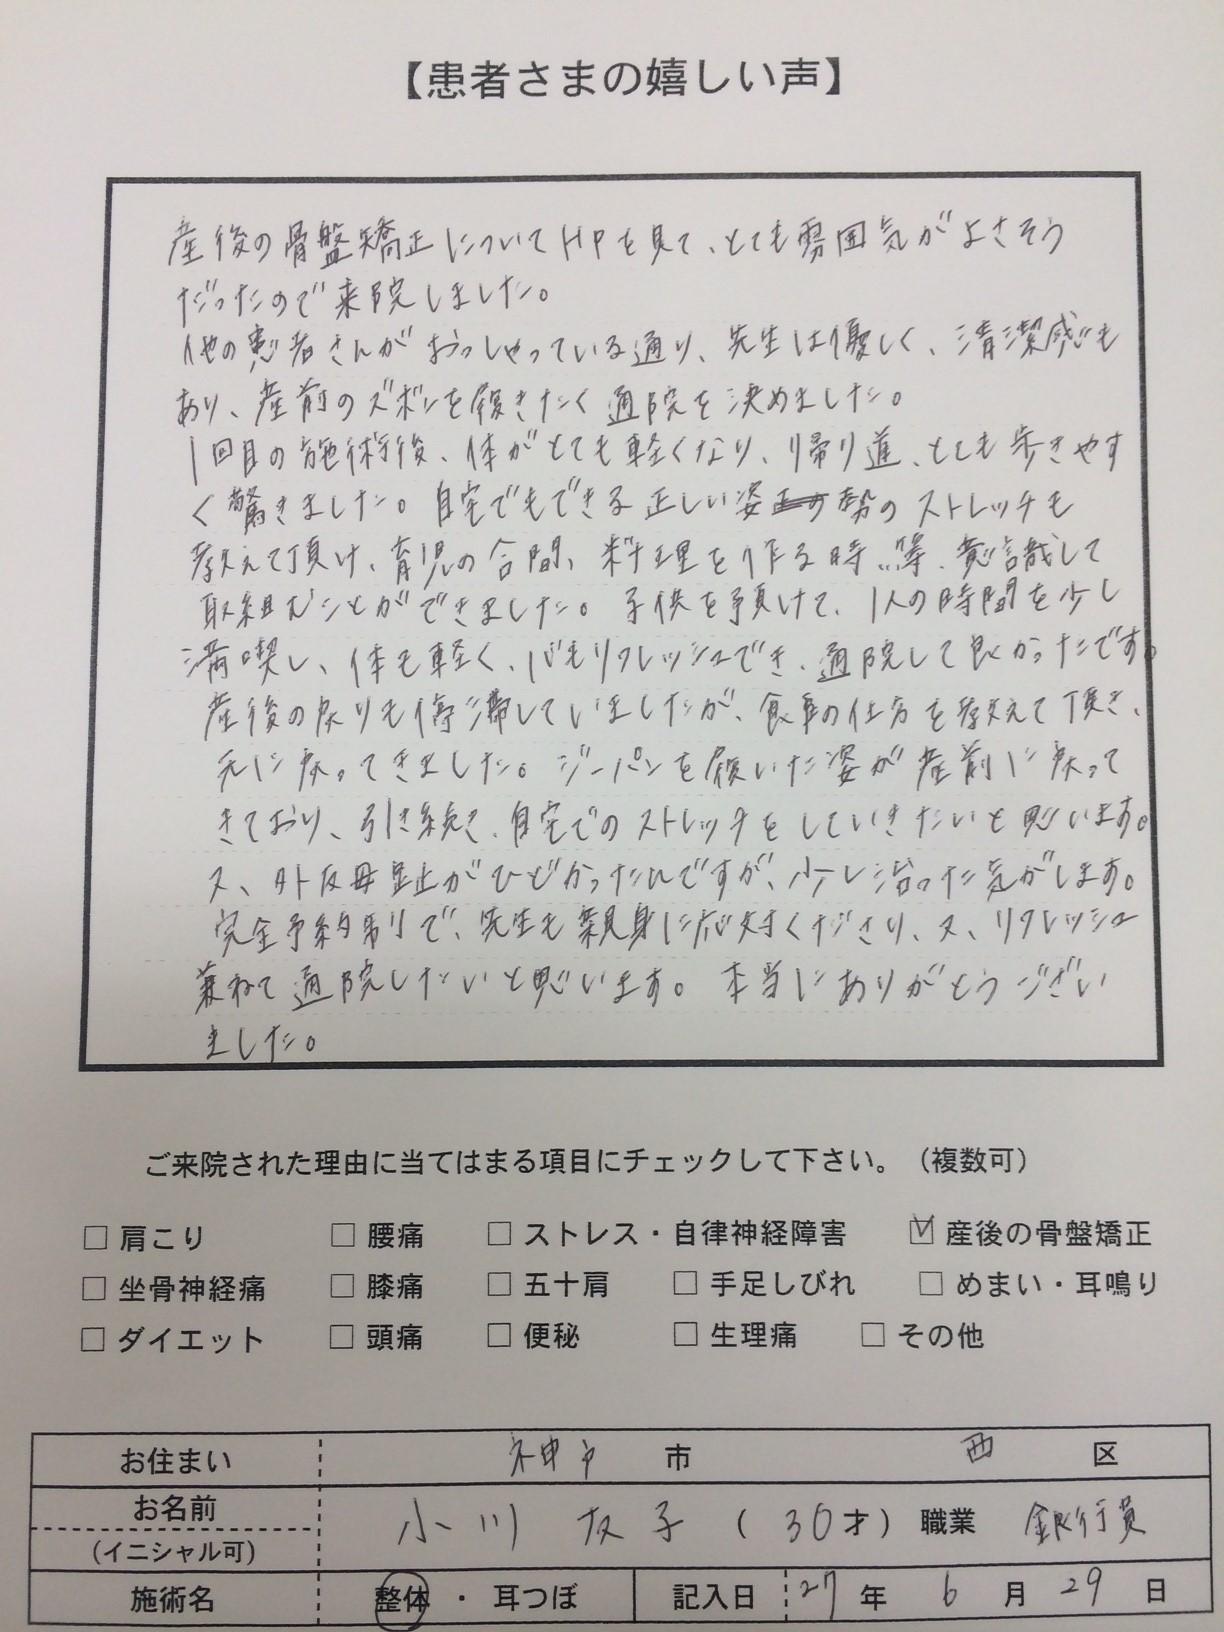 ogawa さま.jpg